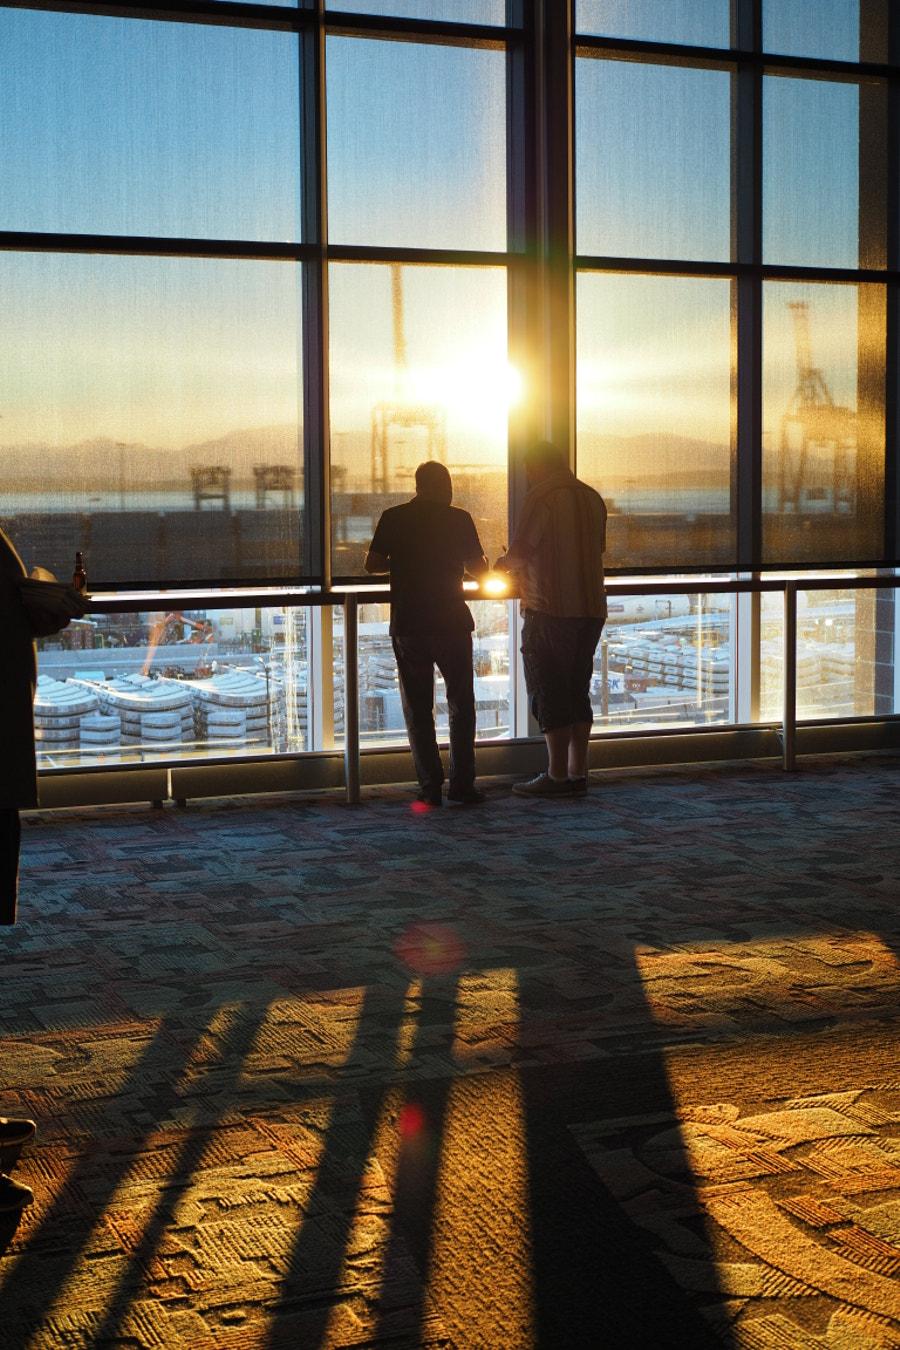 seattle sunset by Guilhem on 500px.com